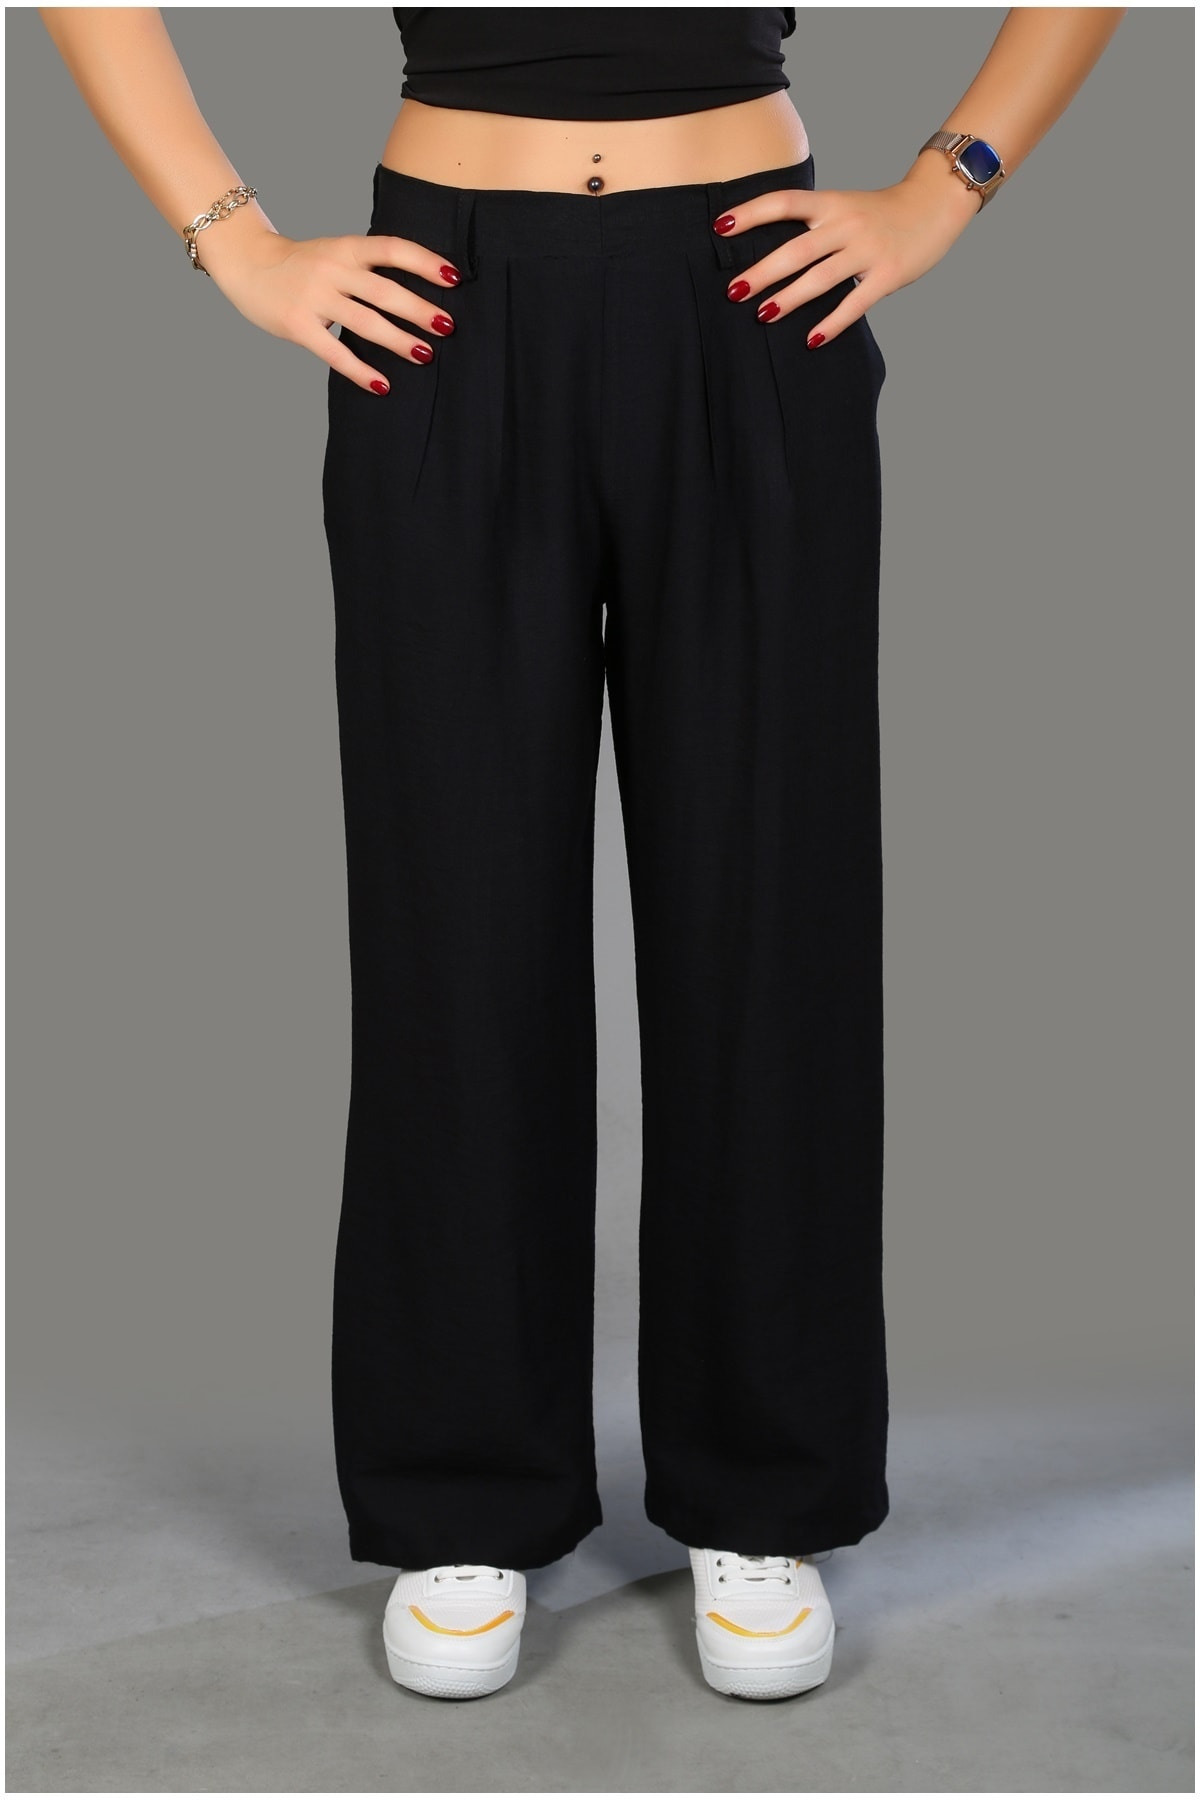 Modaceda Kadın Siyah Cepli Pantolon 1